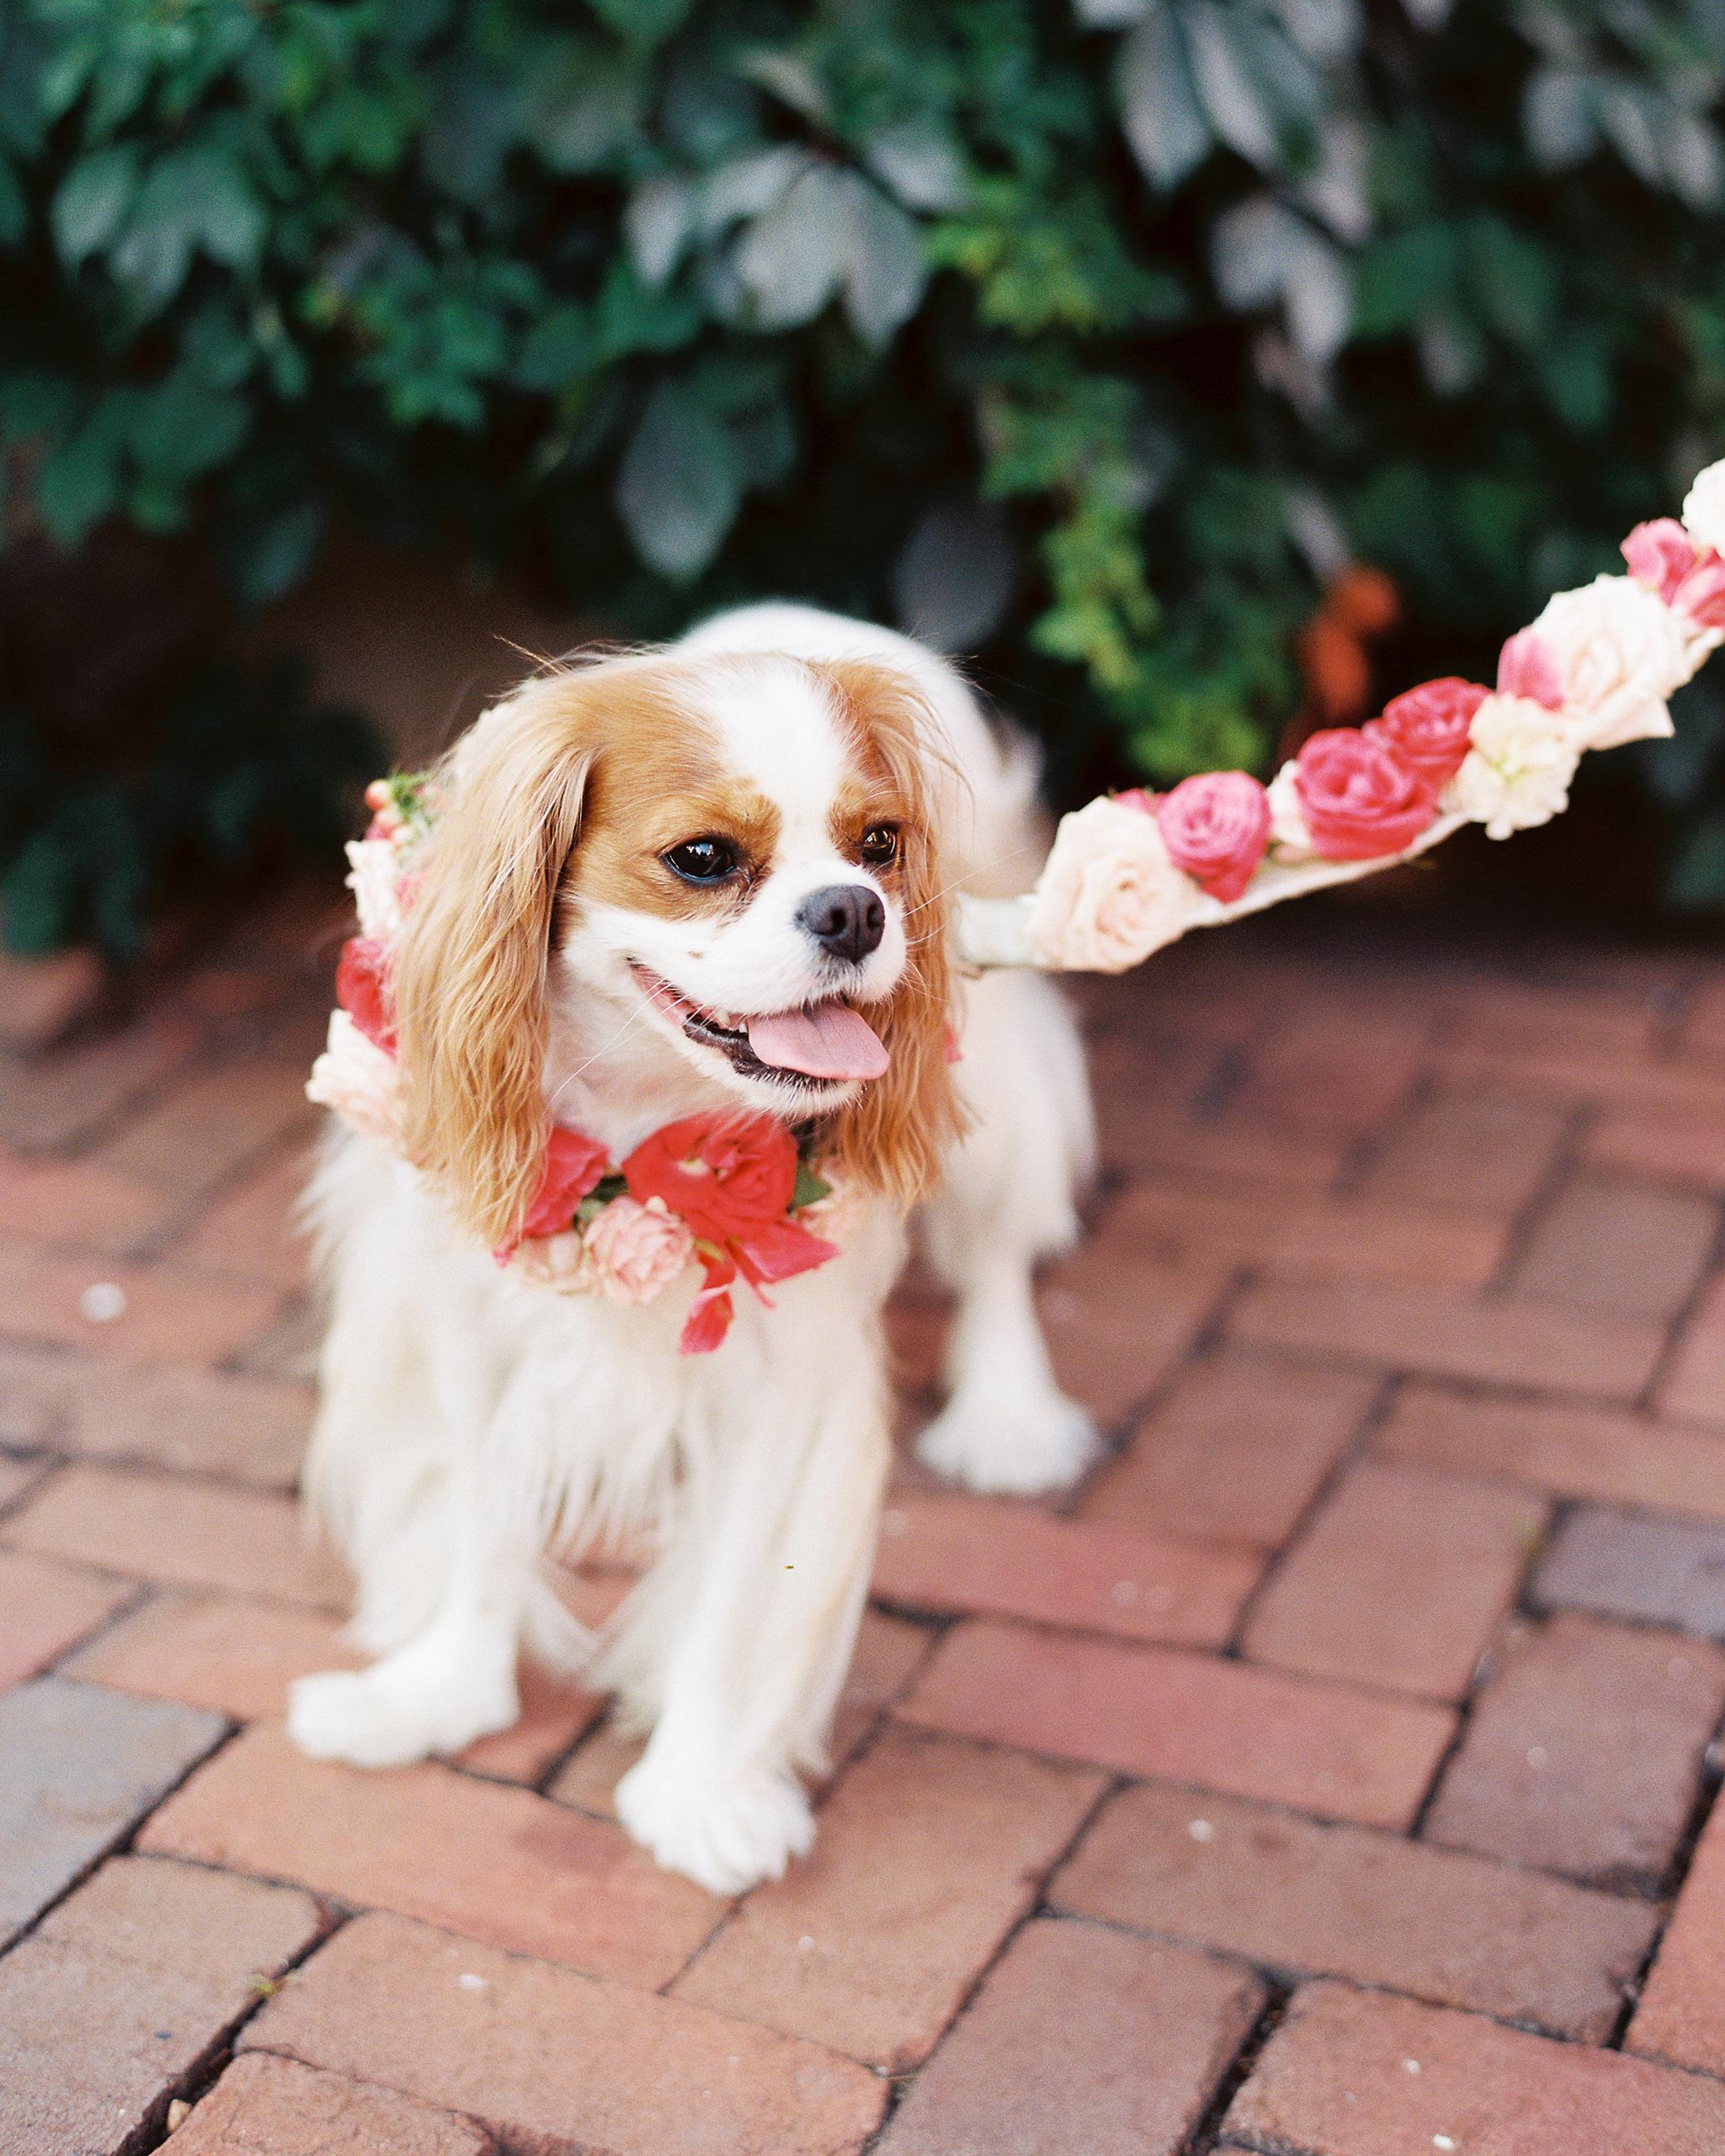 molly-patrick-wedding-dog-3271-s111760-0115.jpg